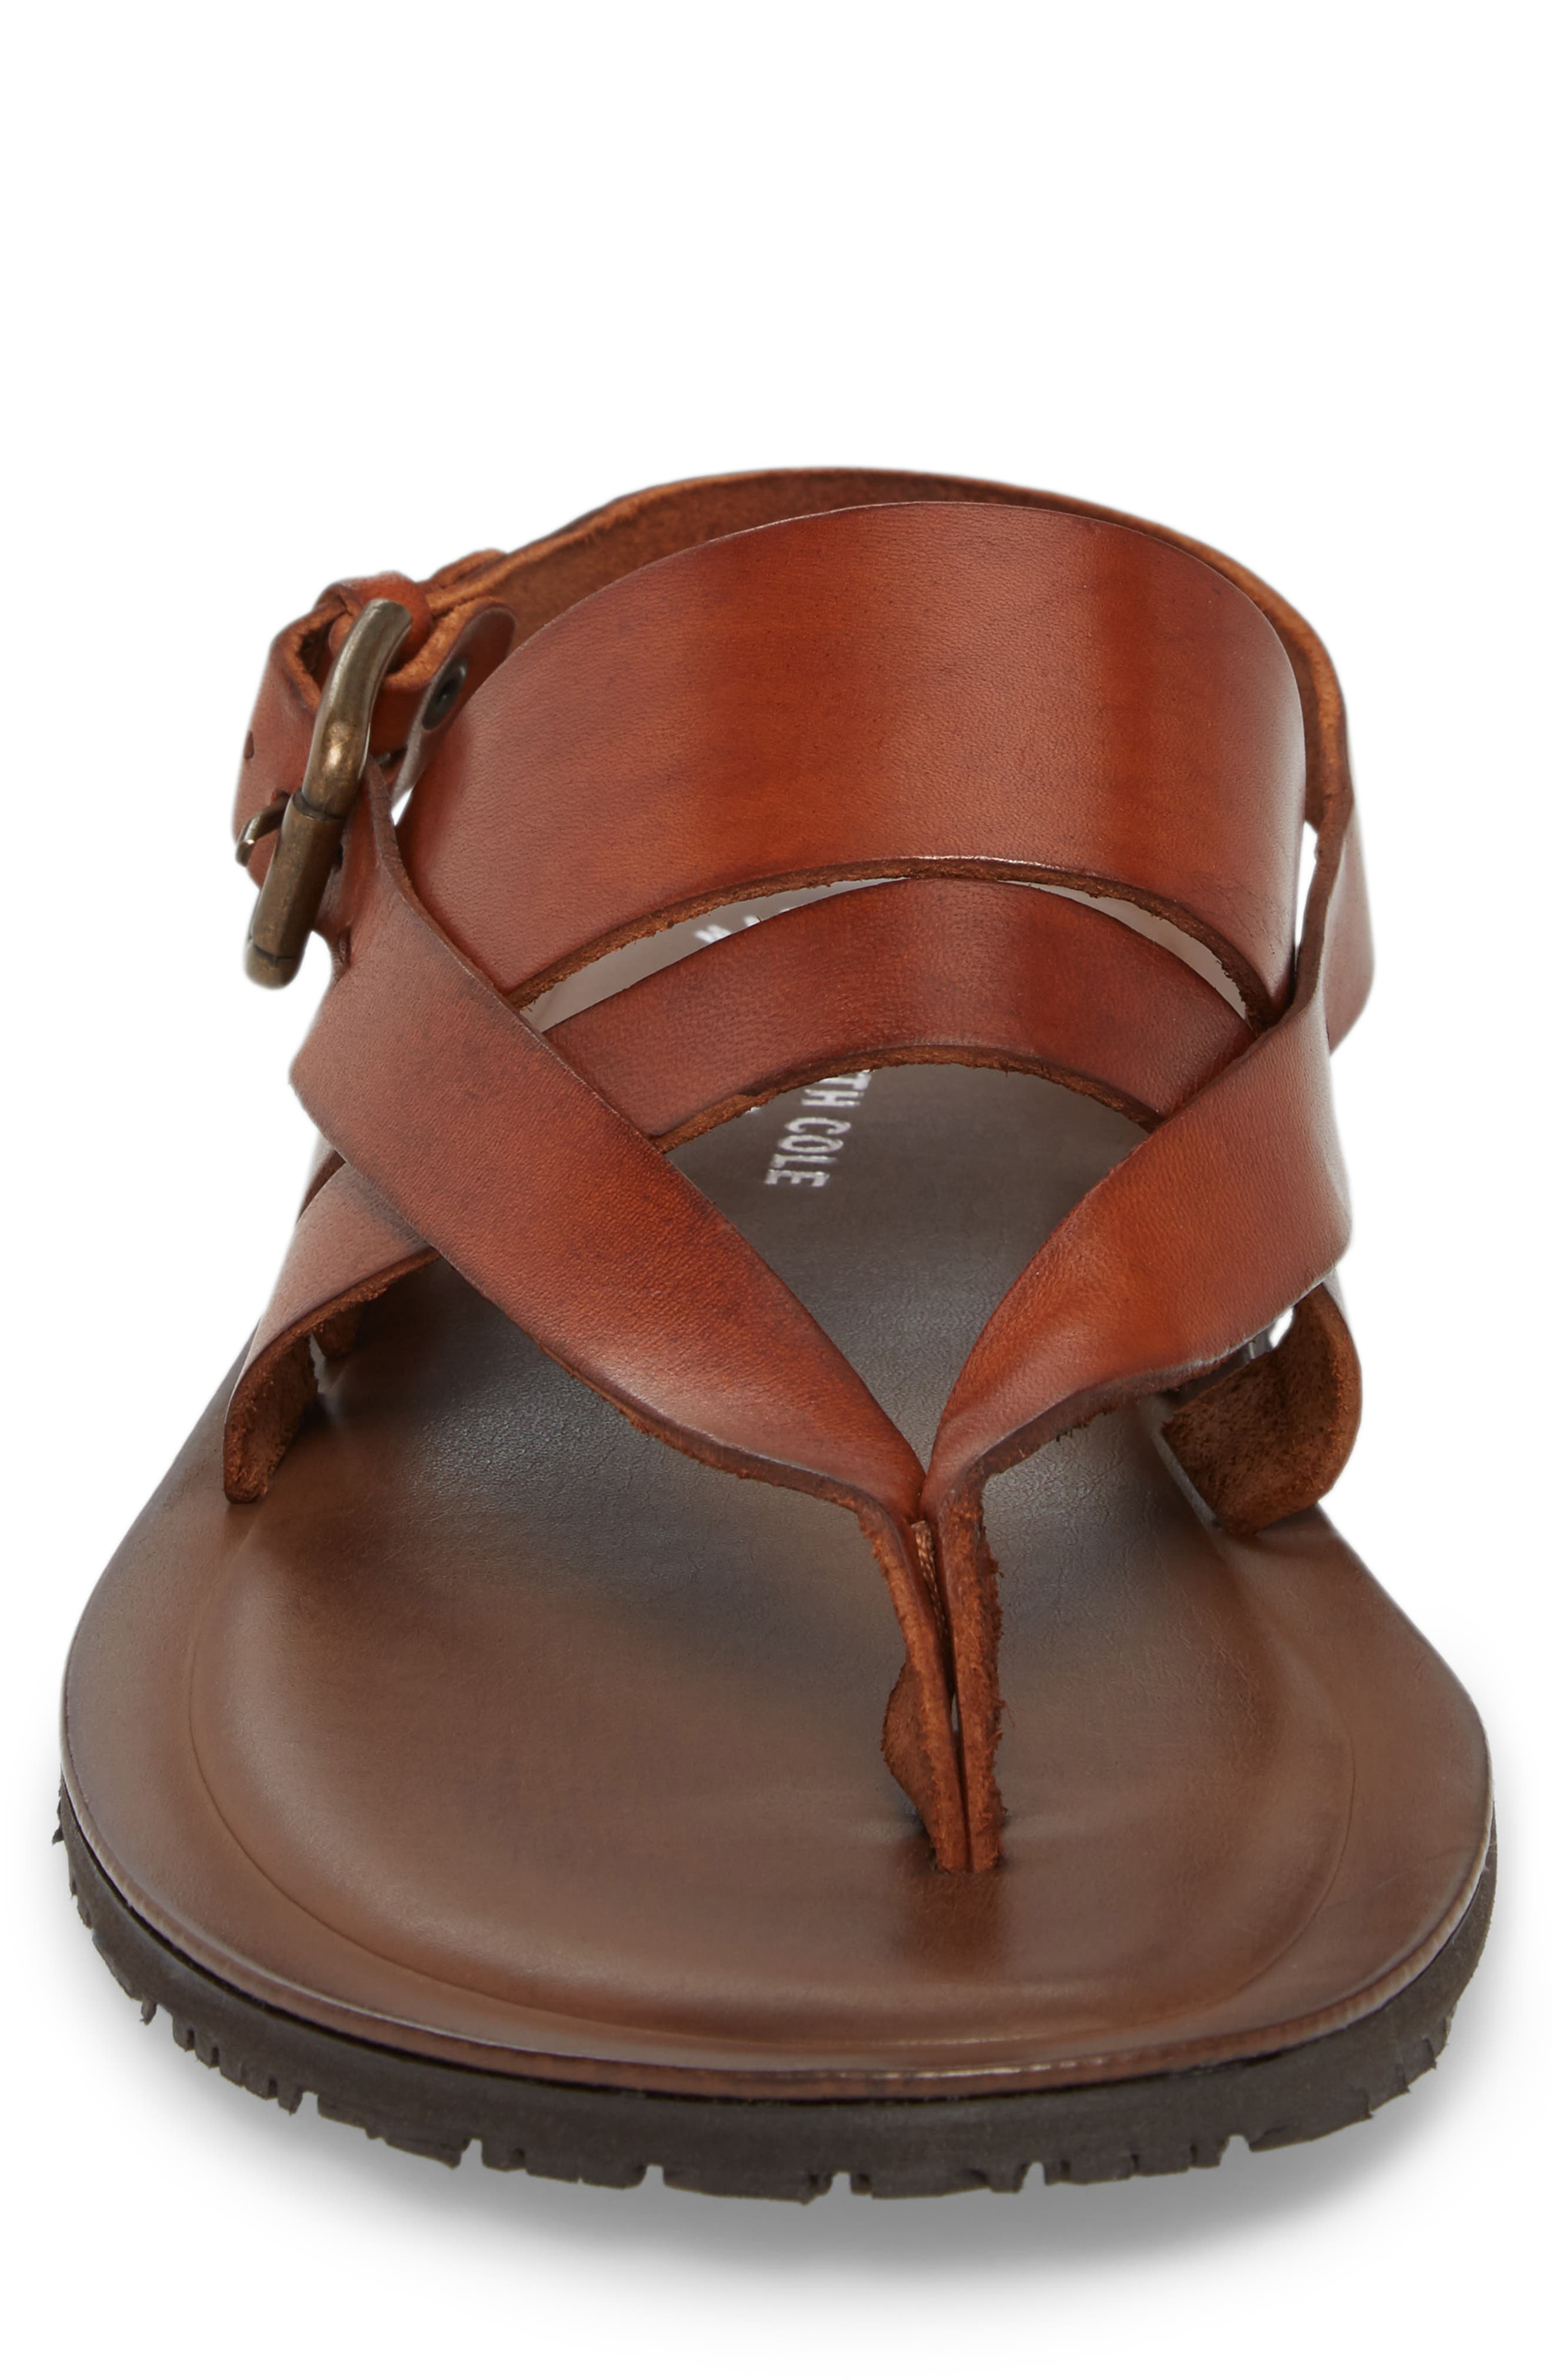 'Reel-Ist' Sandal,                             Alternate thumbnail 4, color,                             Cognac Leather